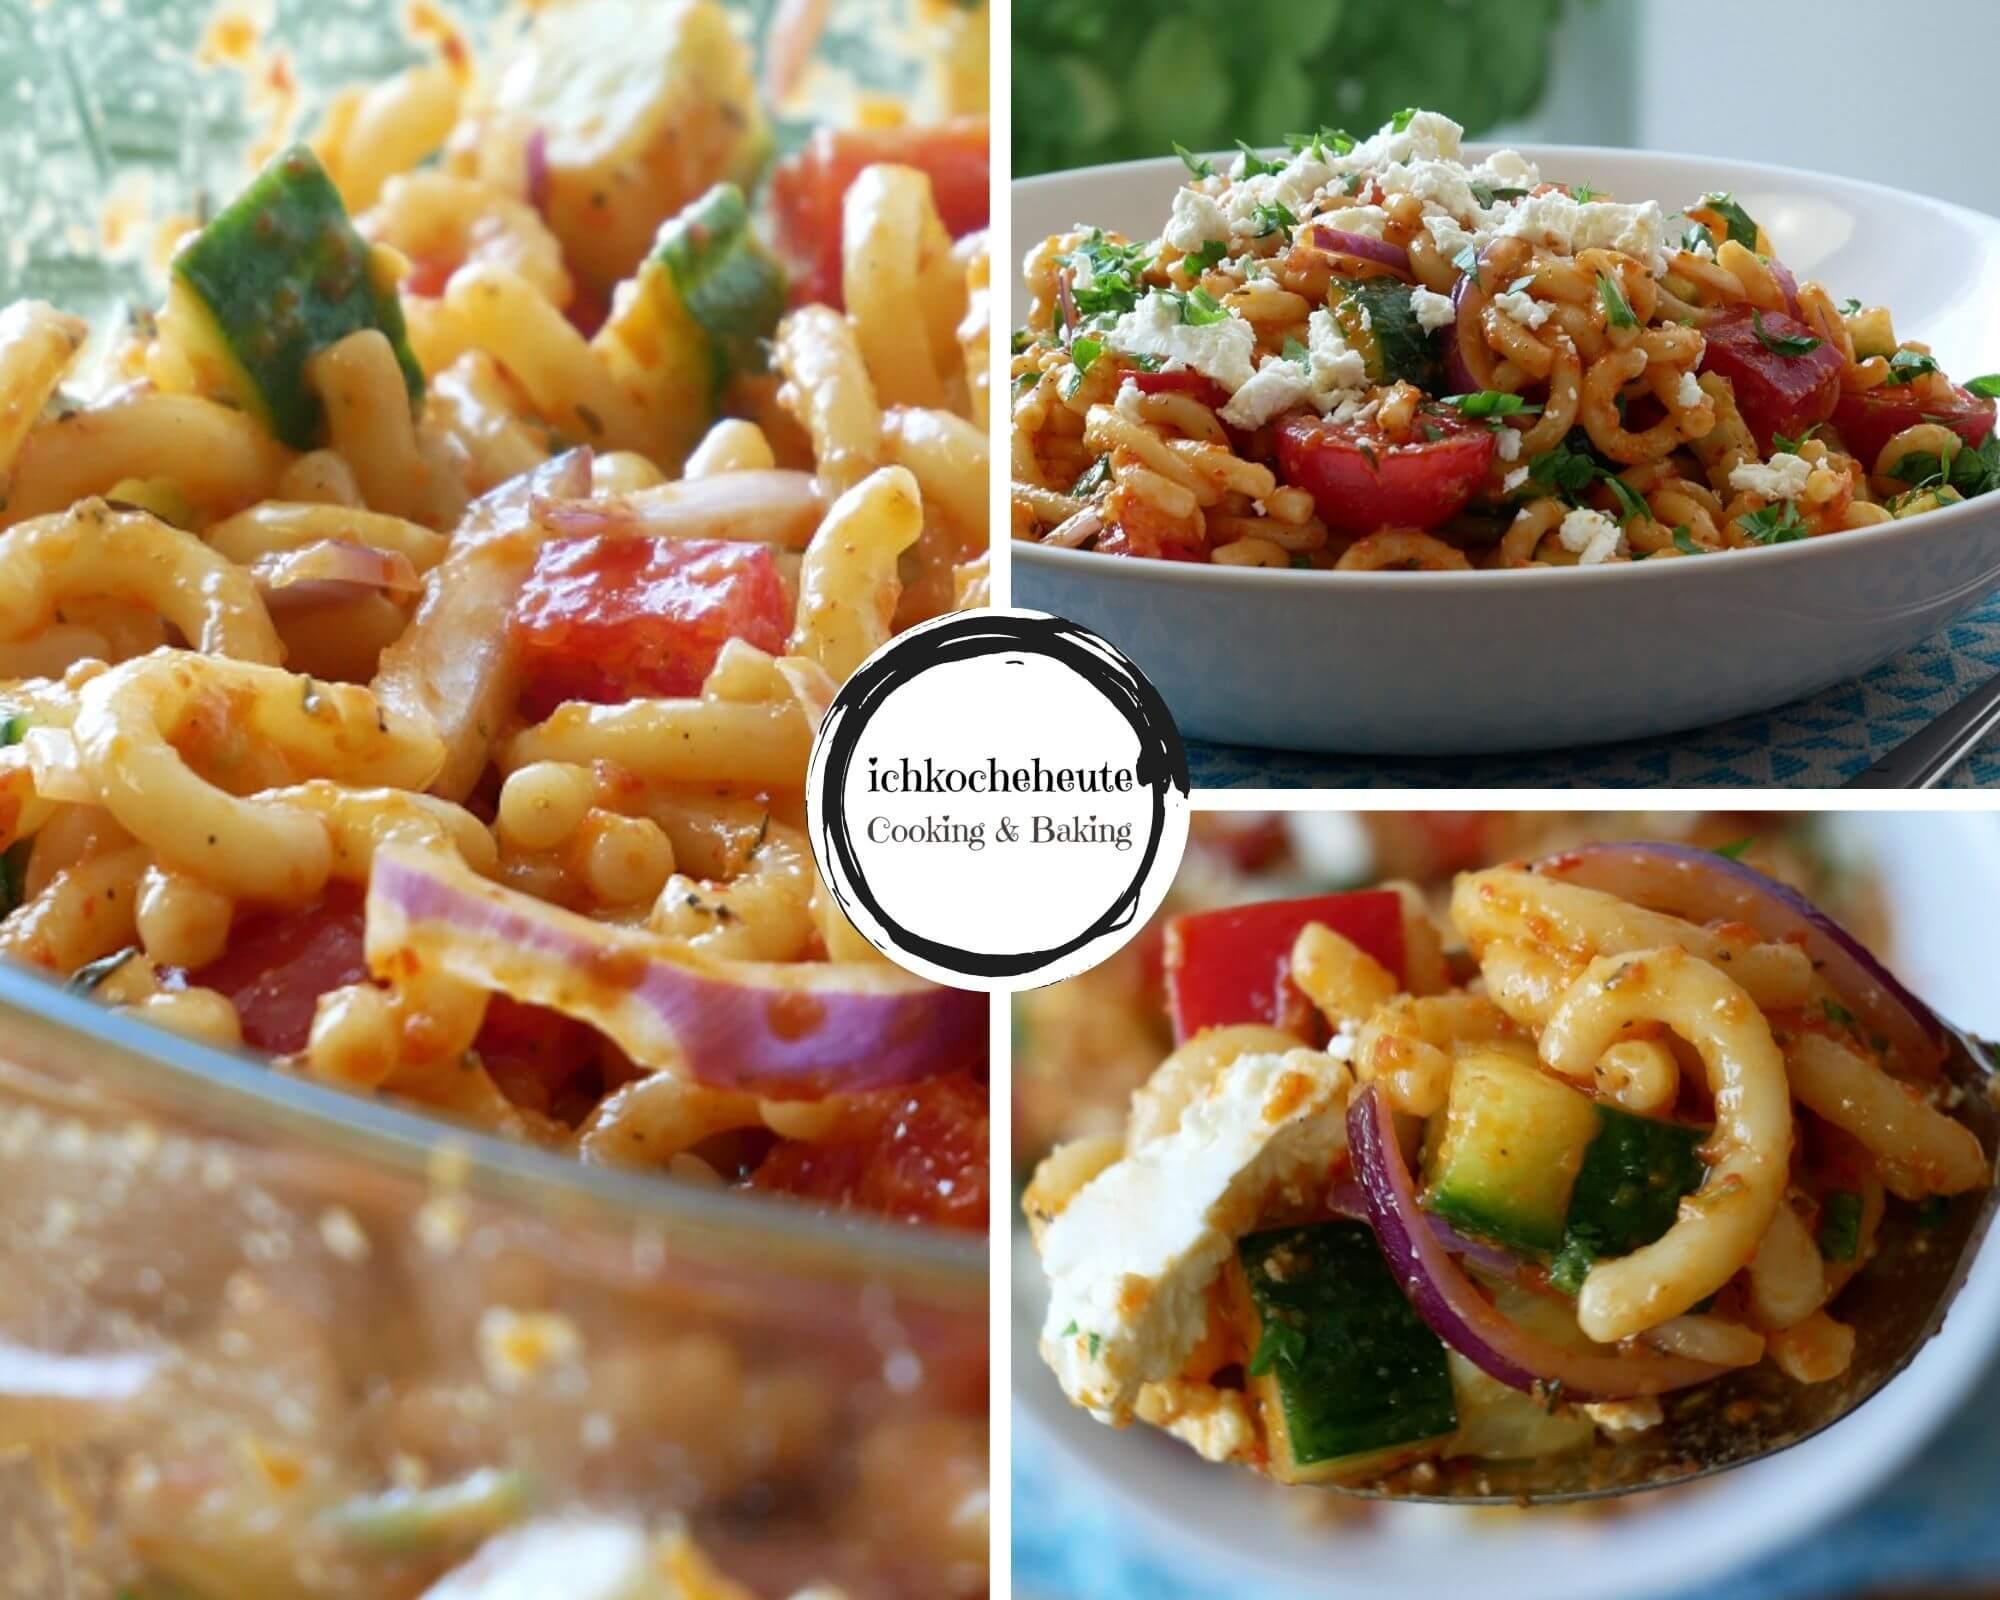 Serving Pasta Salad with Feta & Veggies